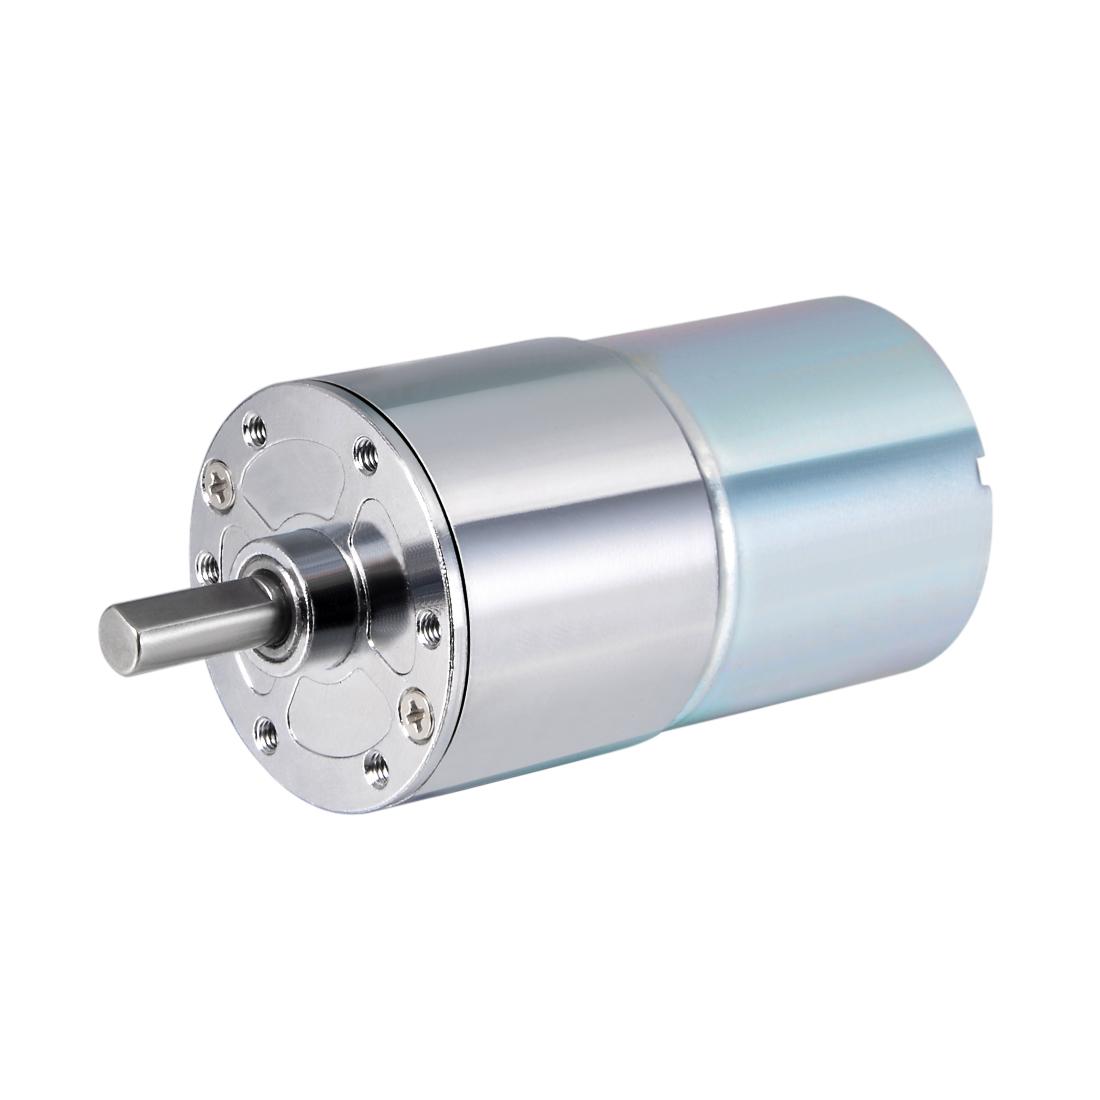 12V DC 20 RPM Gear Motor High Torque Reduction Gearbox Centric Output Shaft